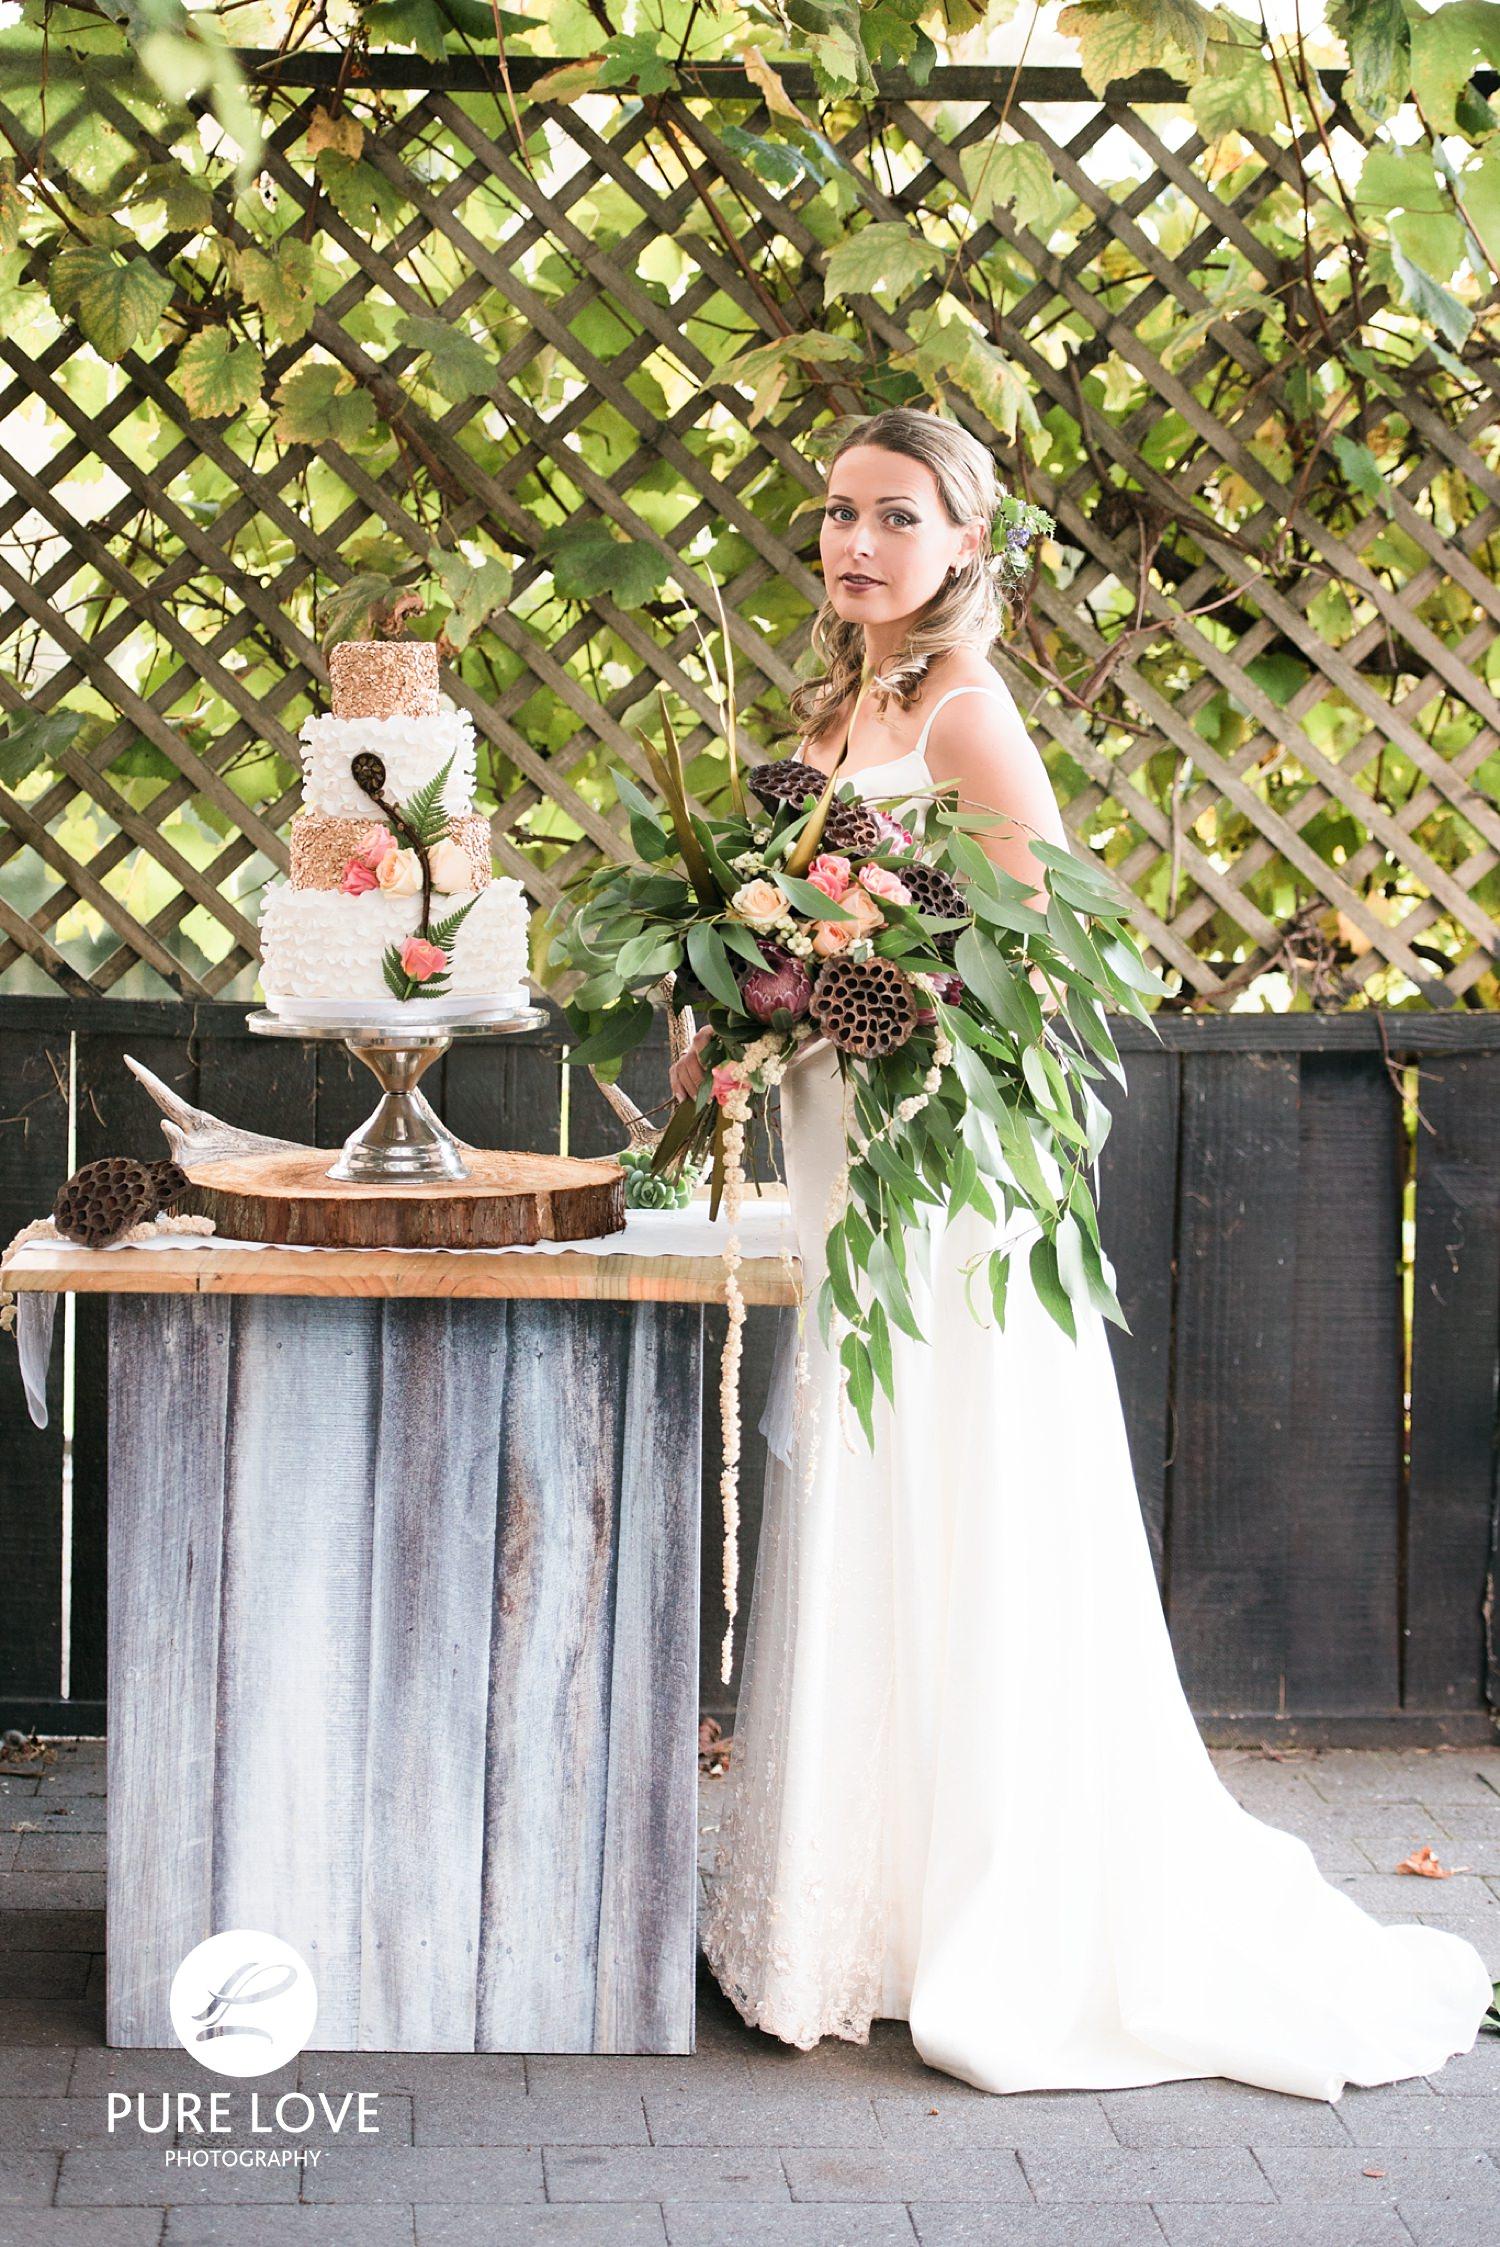 Wedding Cake by  Our Cake Company , Rotorua.